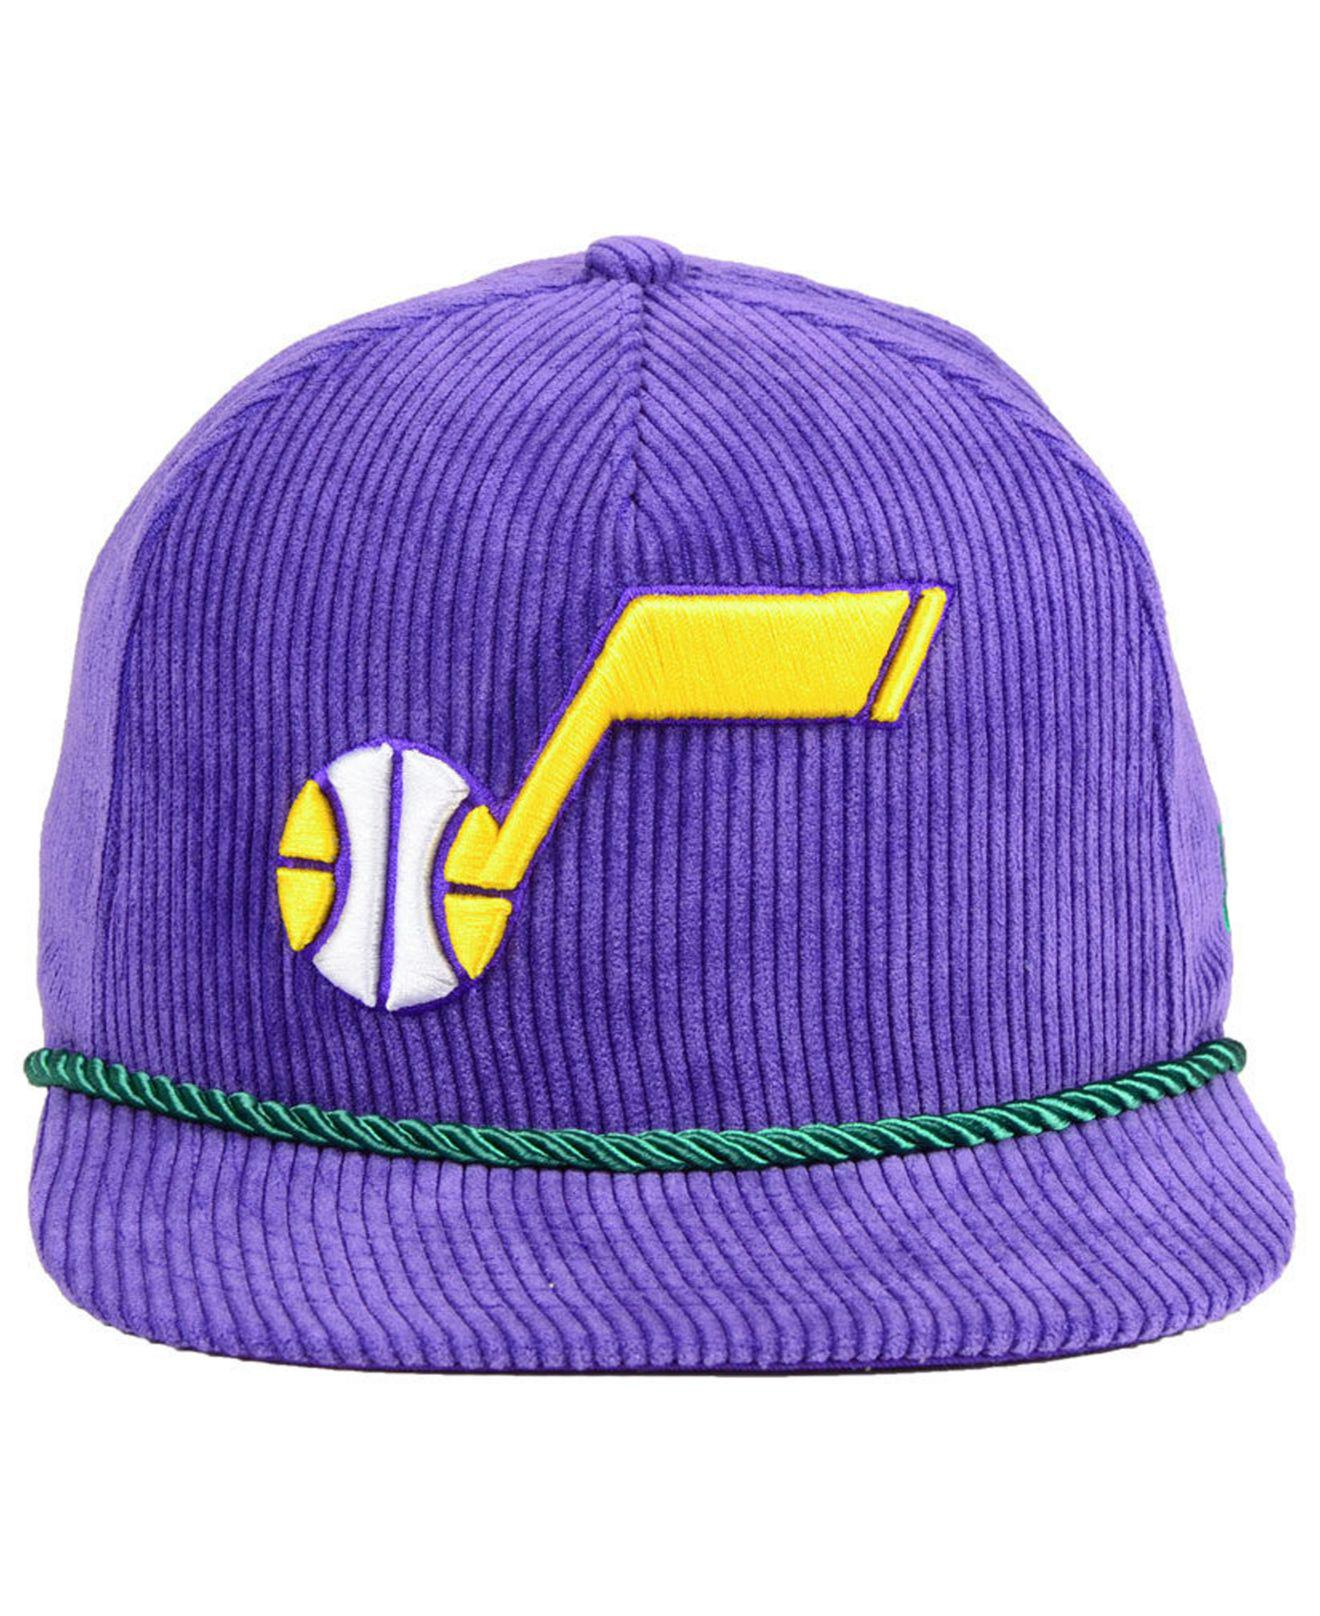 Lyst - KTZ Utah Jazz Hardwood Classic Nights Cords 9fifty Snapback Cap in  Purple for Men 2ee0aaad8